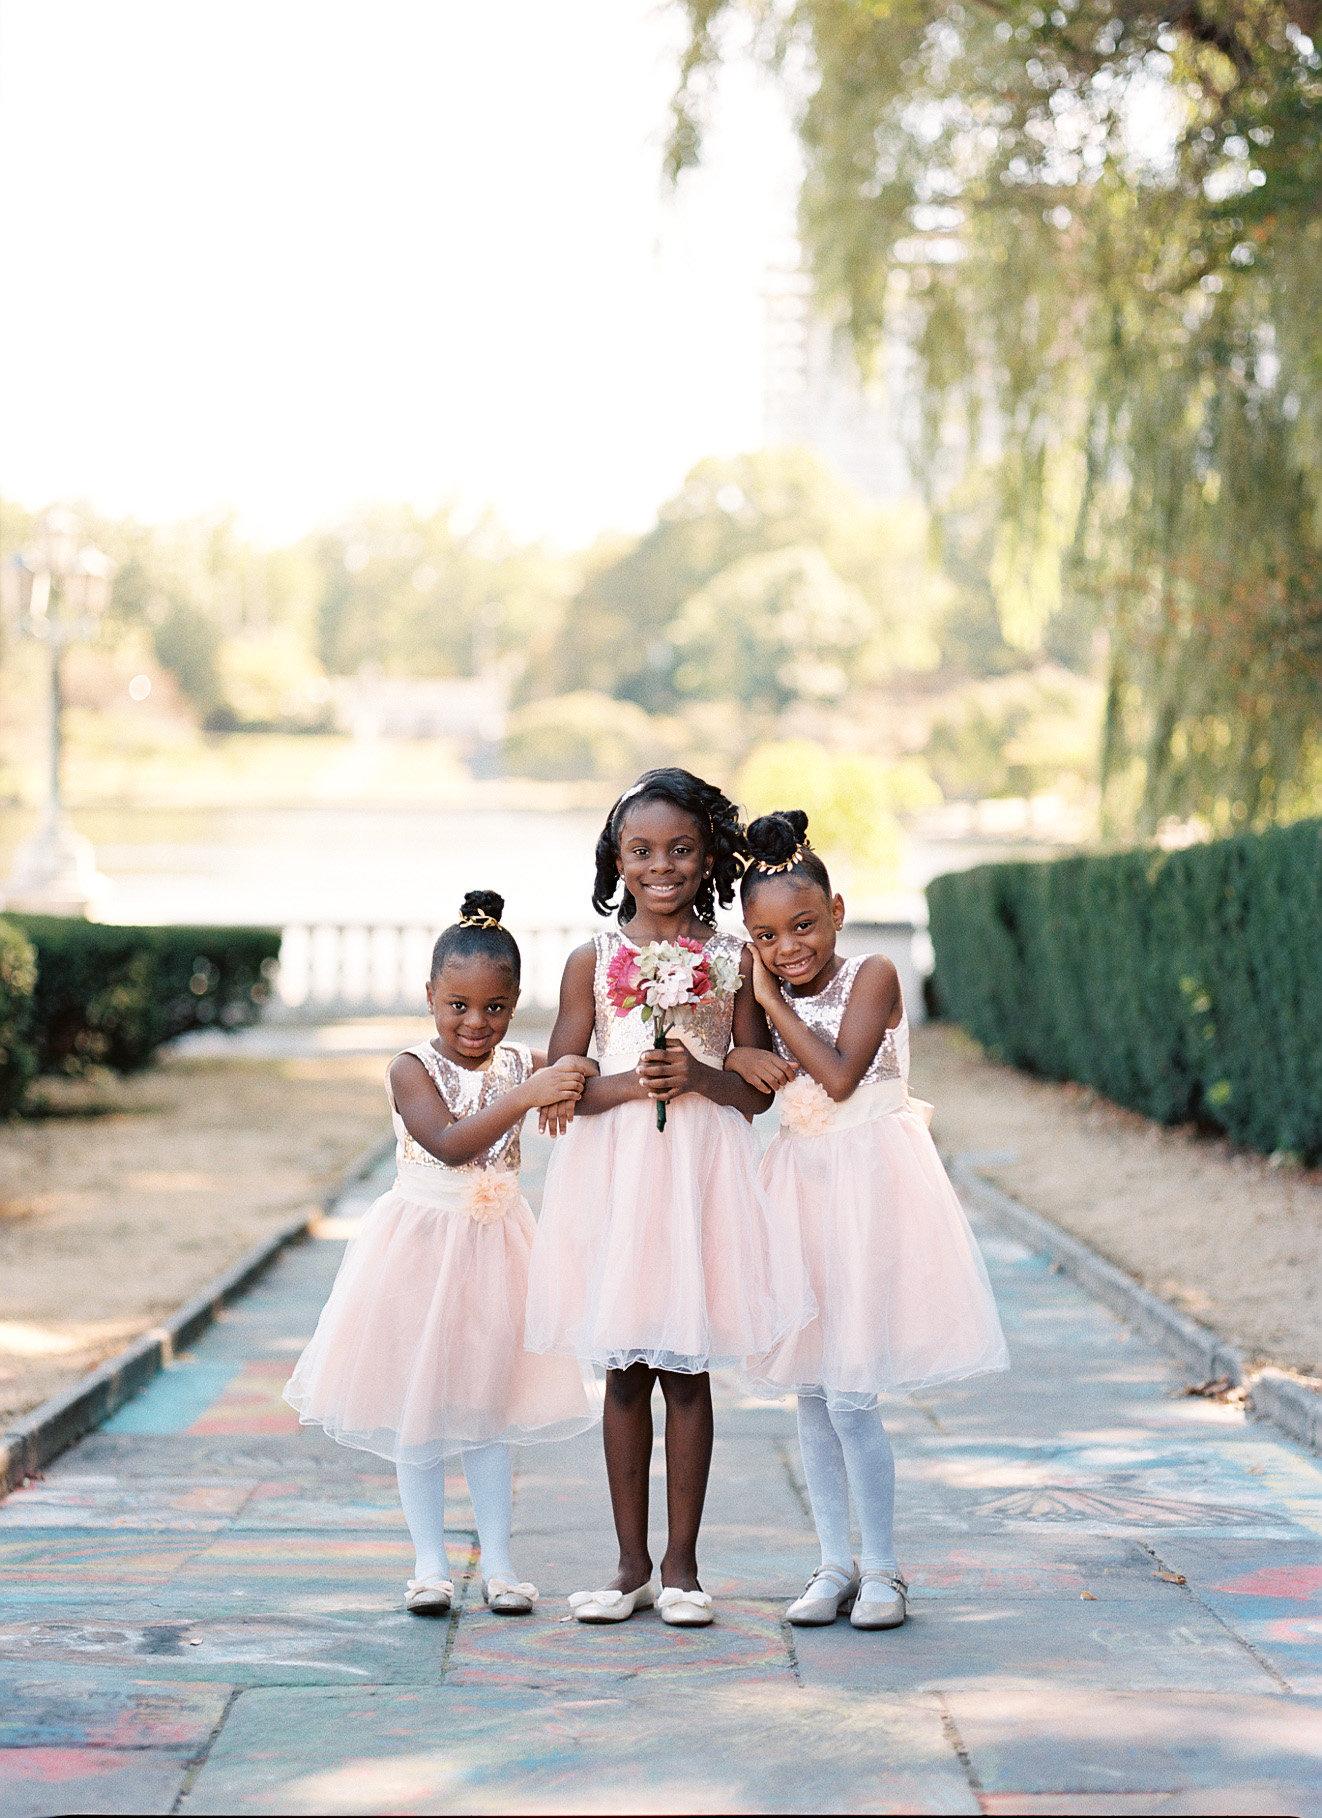 shanice & stephen wedding flower girls